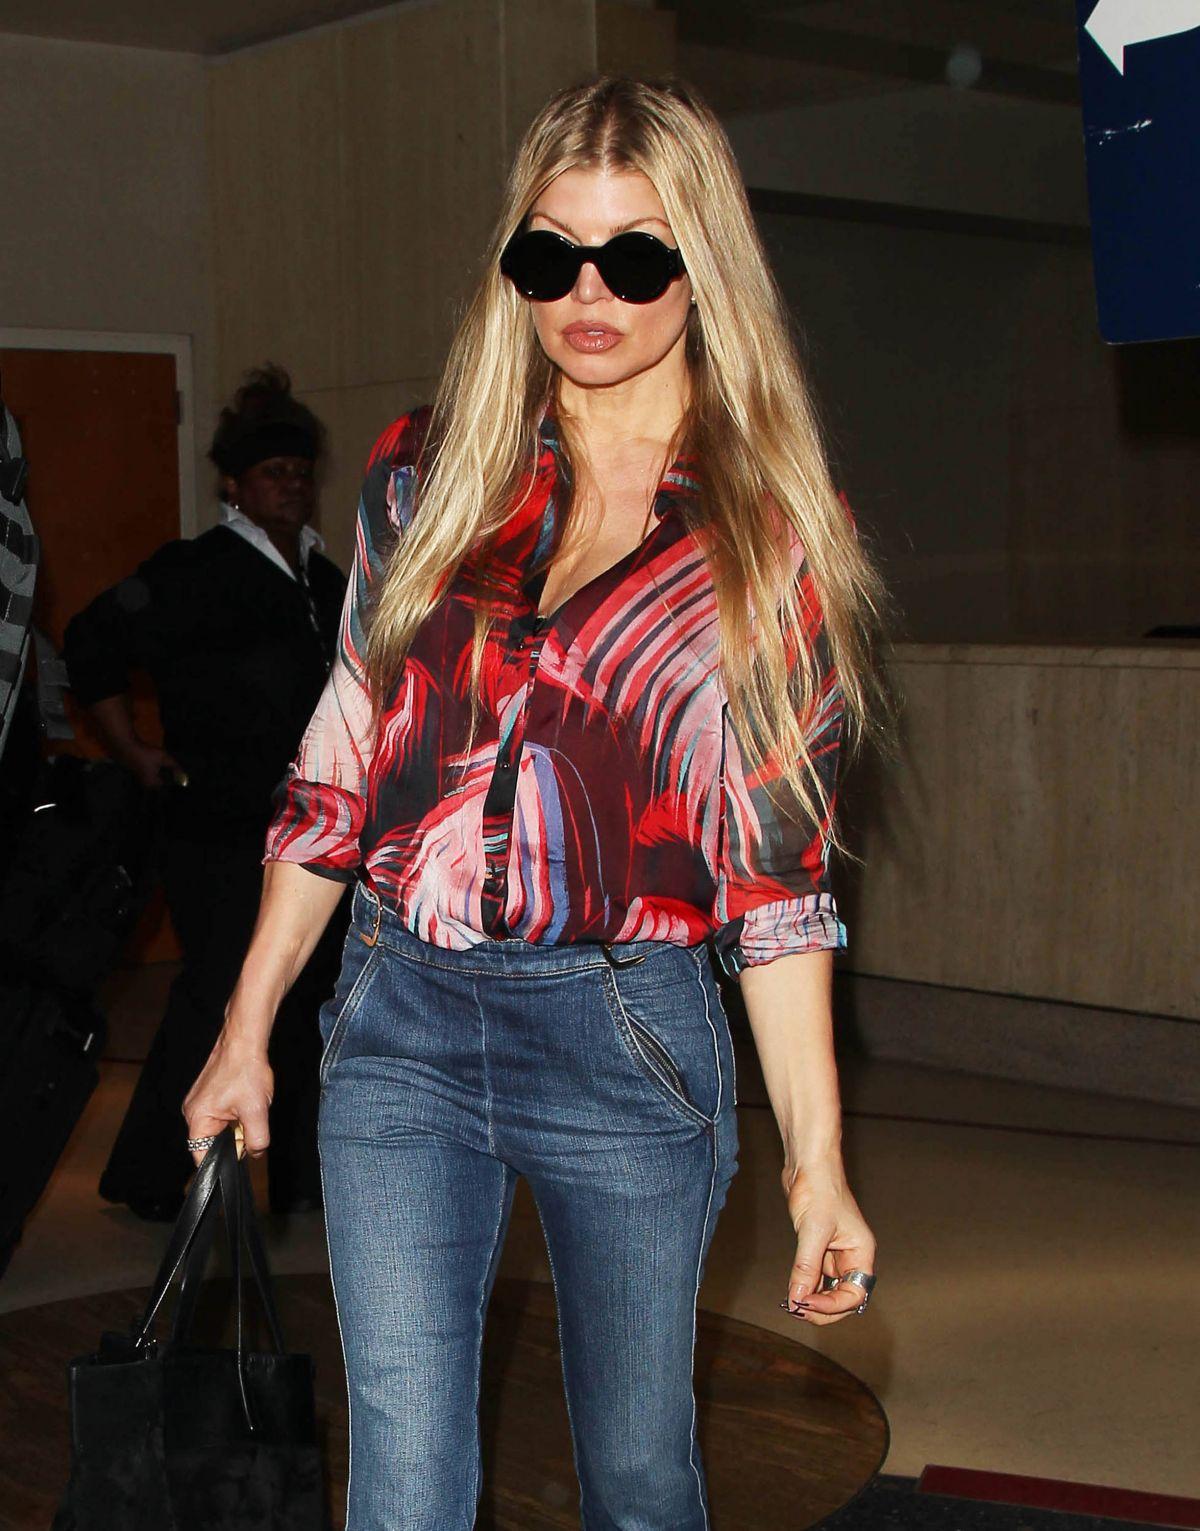 STACY FERGIE FERGUSON at Los Angeles International Airport 05/05/2015